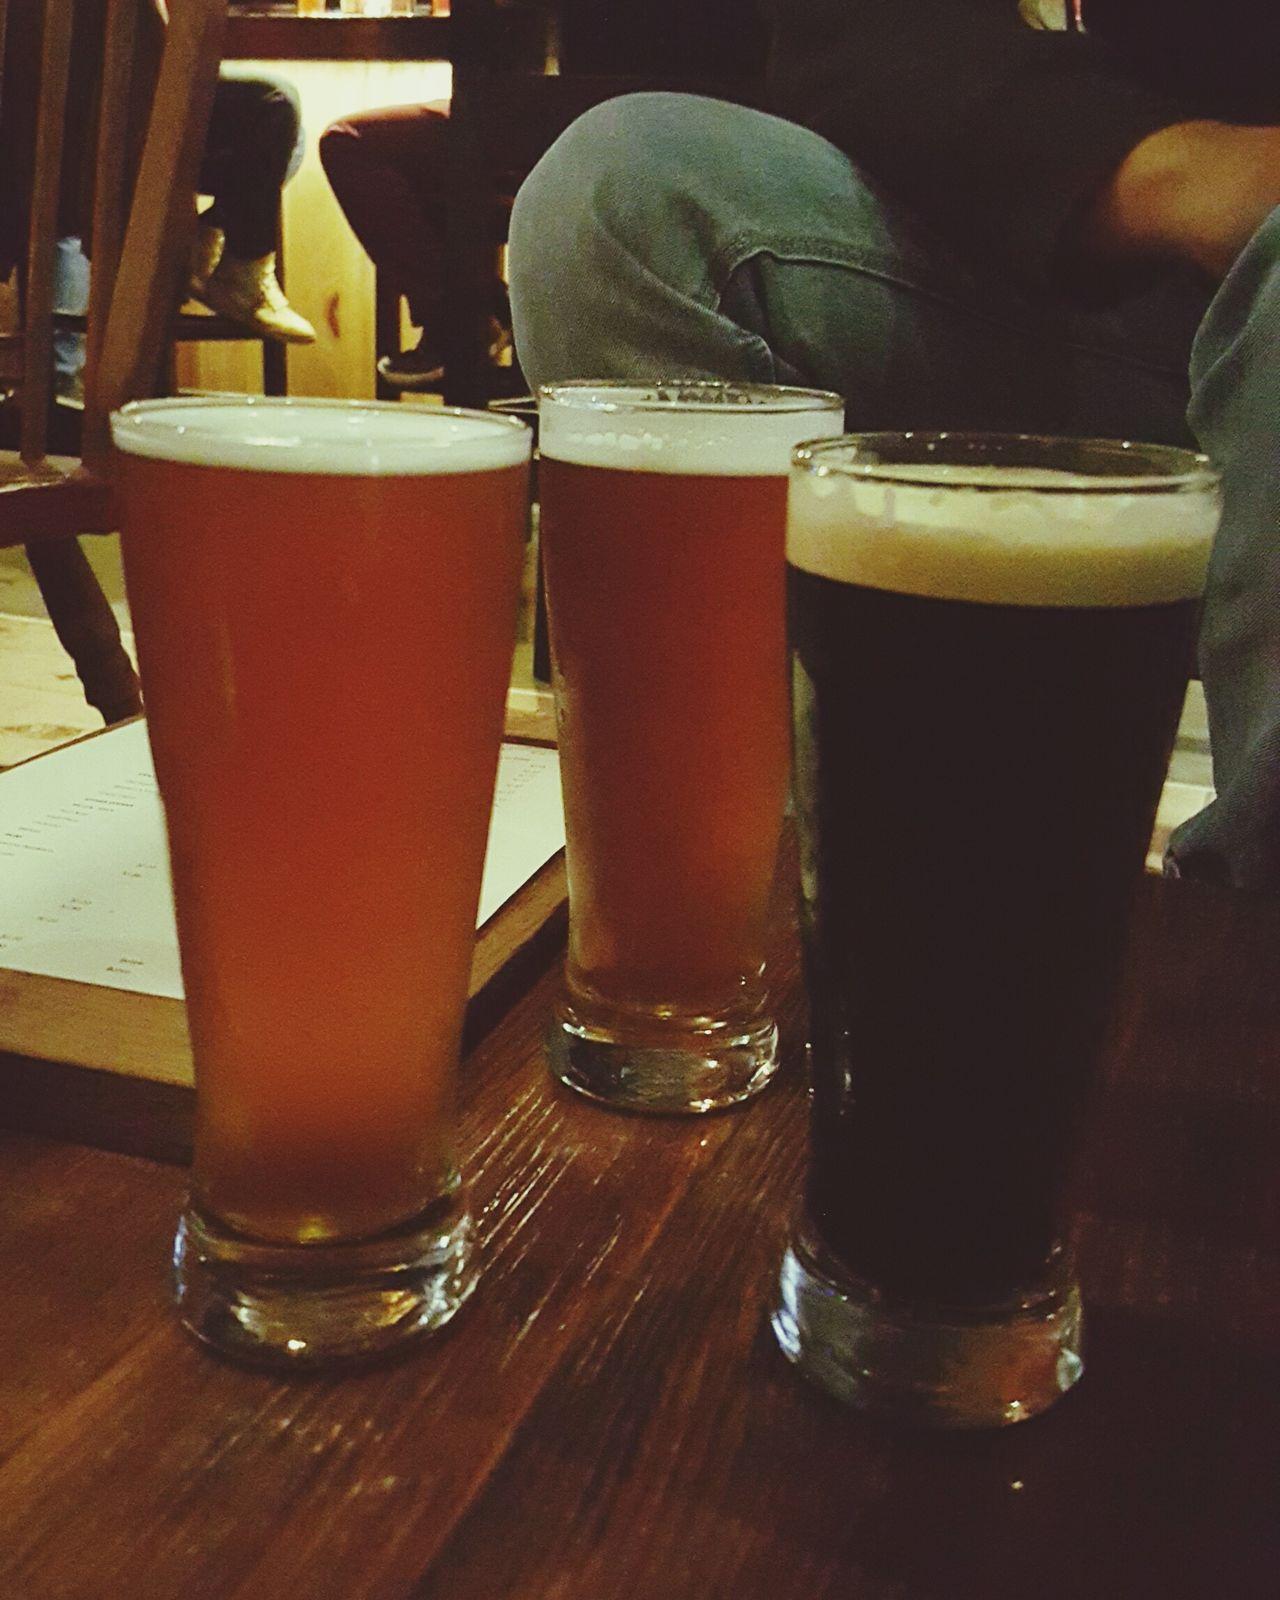 Cervezas artesanales Artesanalbeer Cervezaartesanal Lima-Perú Barranco First Eyeem Photo